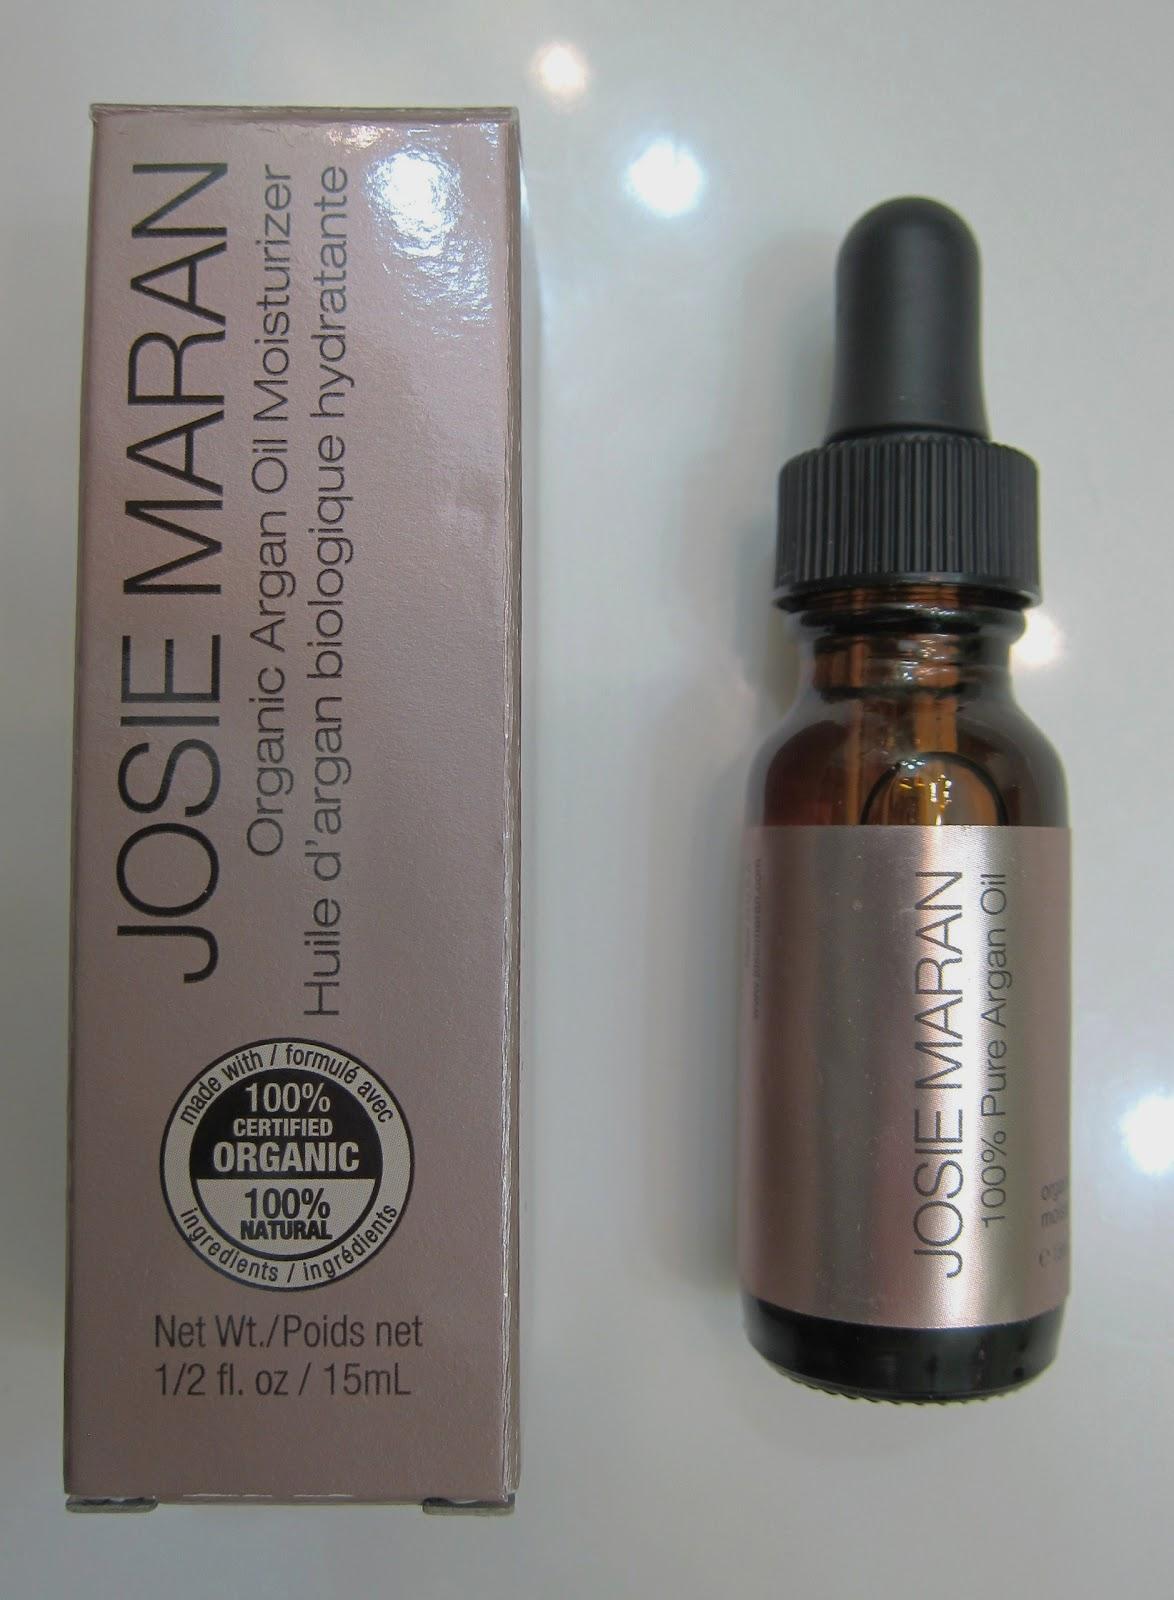 BEAUTIFUL CANVAS: Josie Maran Argan Oil Review Josie Maran Argan Oil Hair